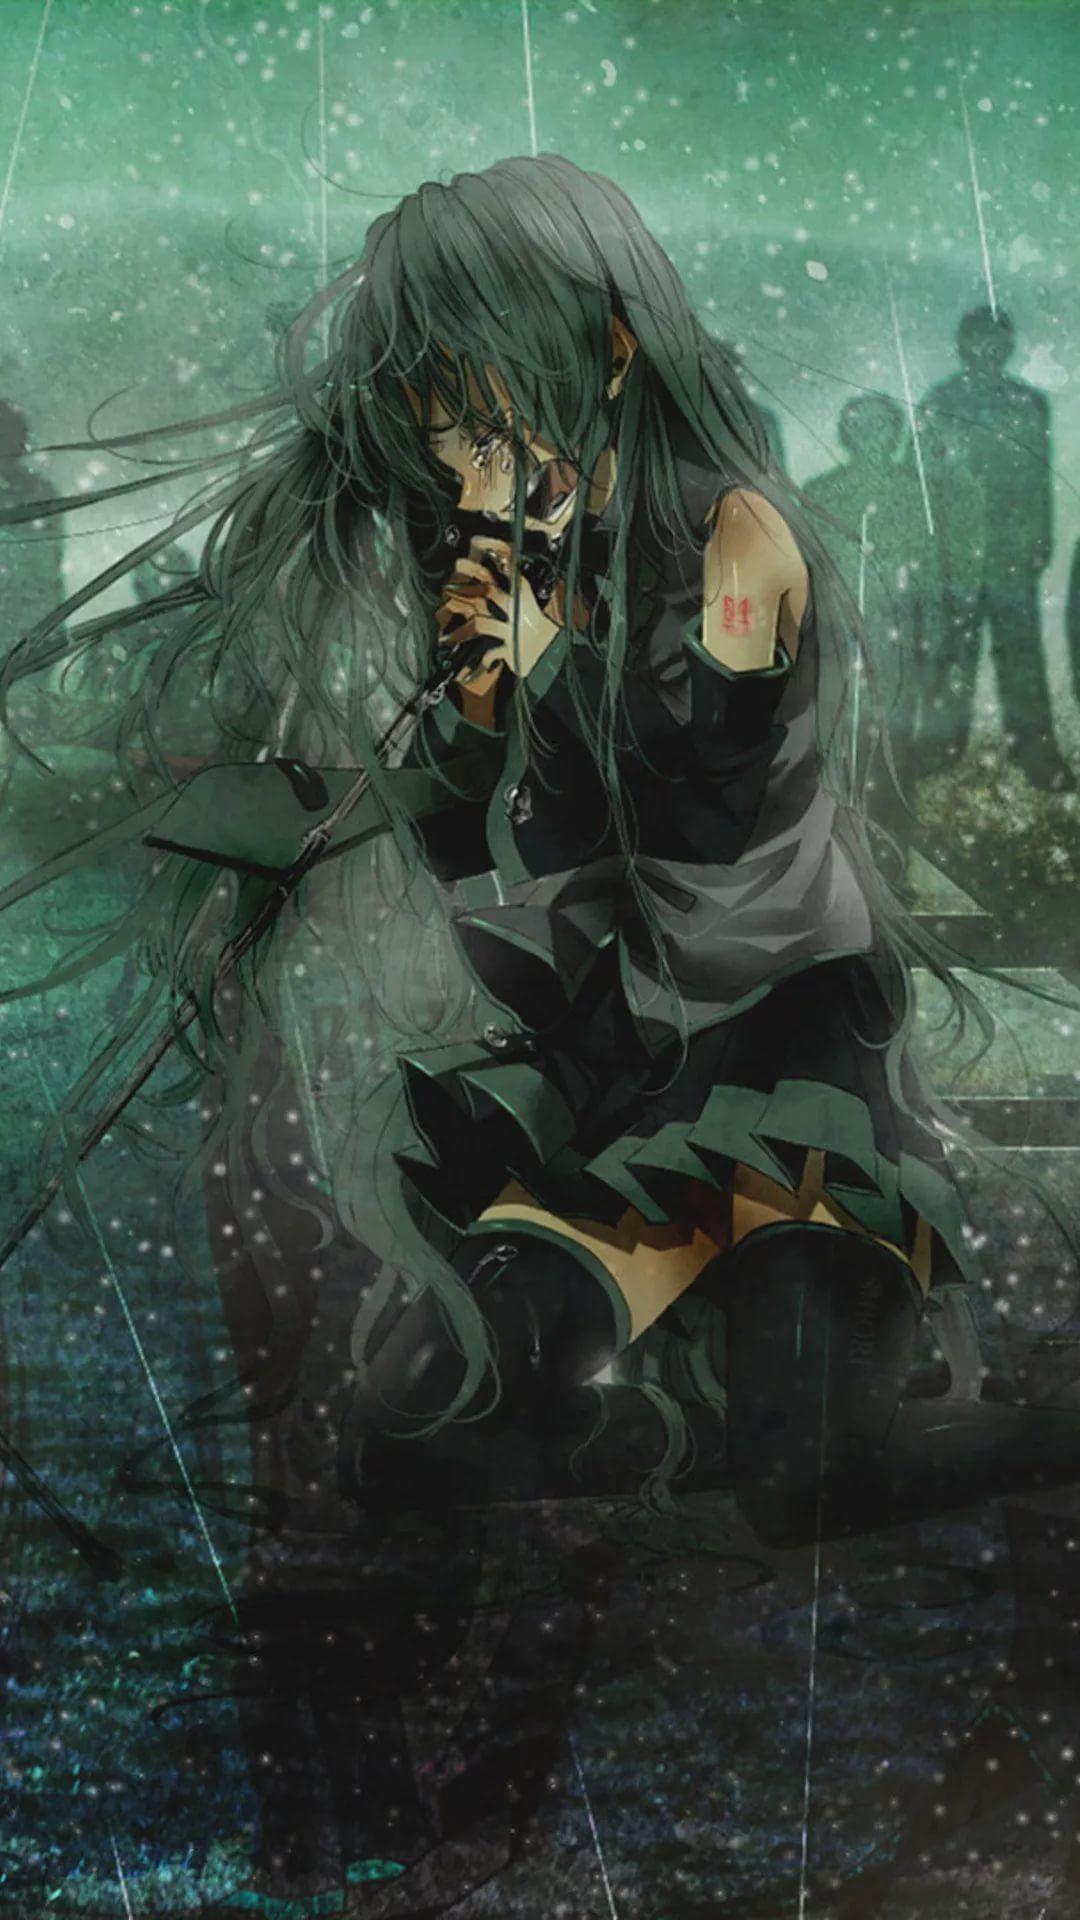 Depressed Anime Girl Wallpaper Posted By John Thompson